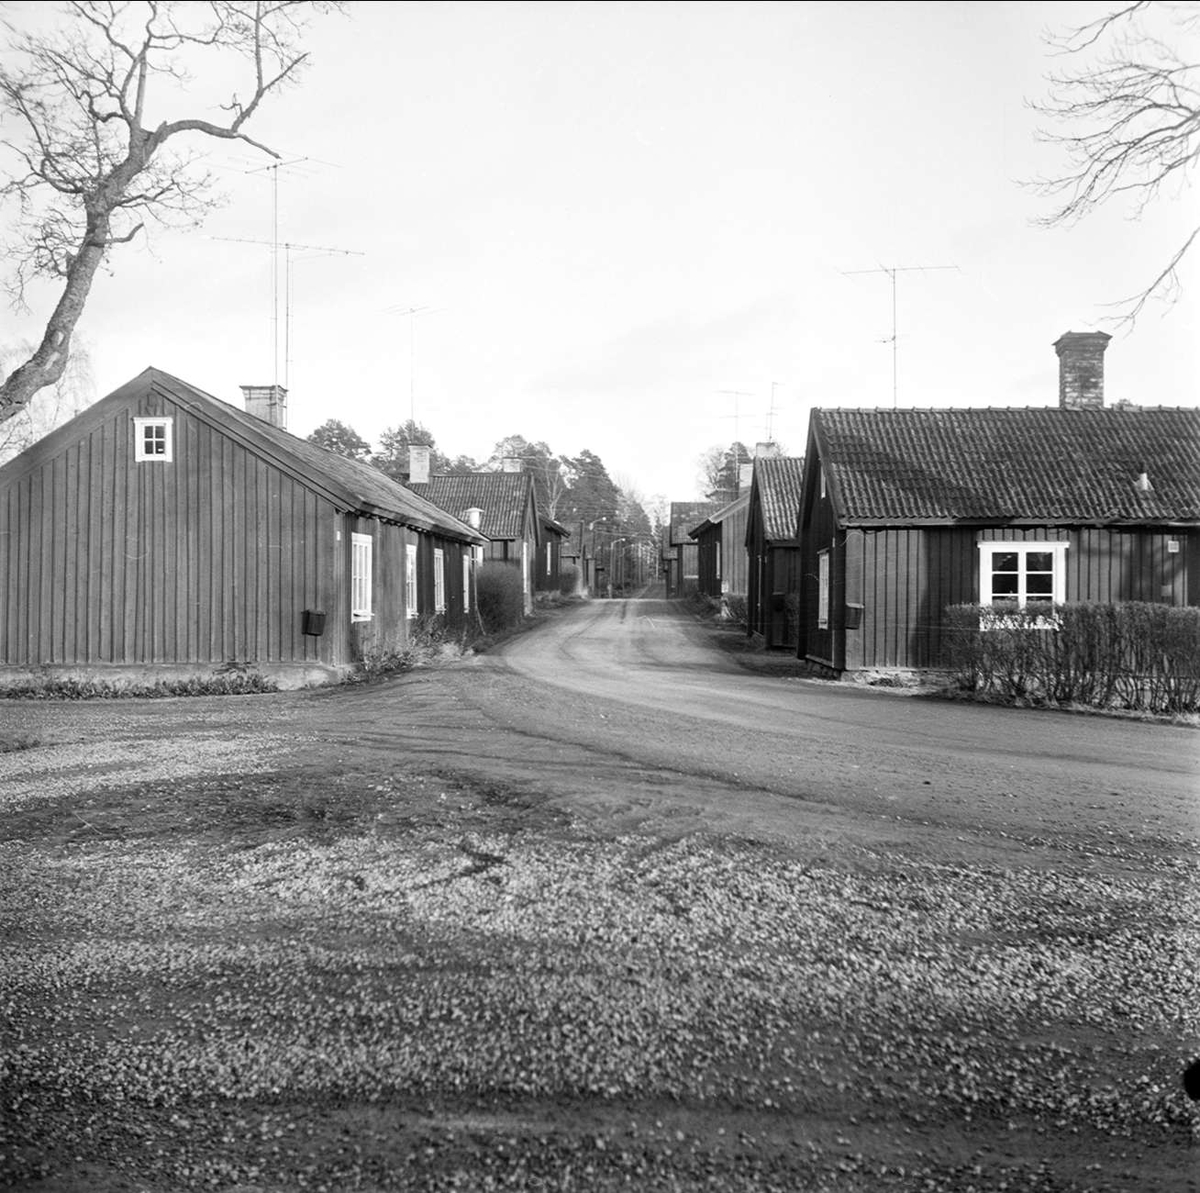 Tobo bruk, Tegelsmora socken, Uppland december 1972